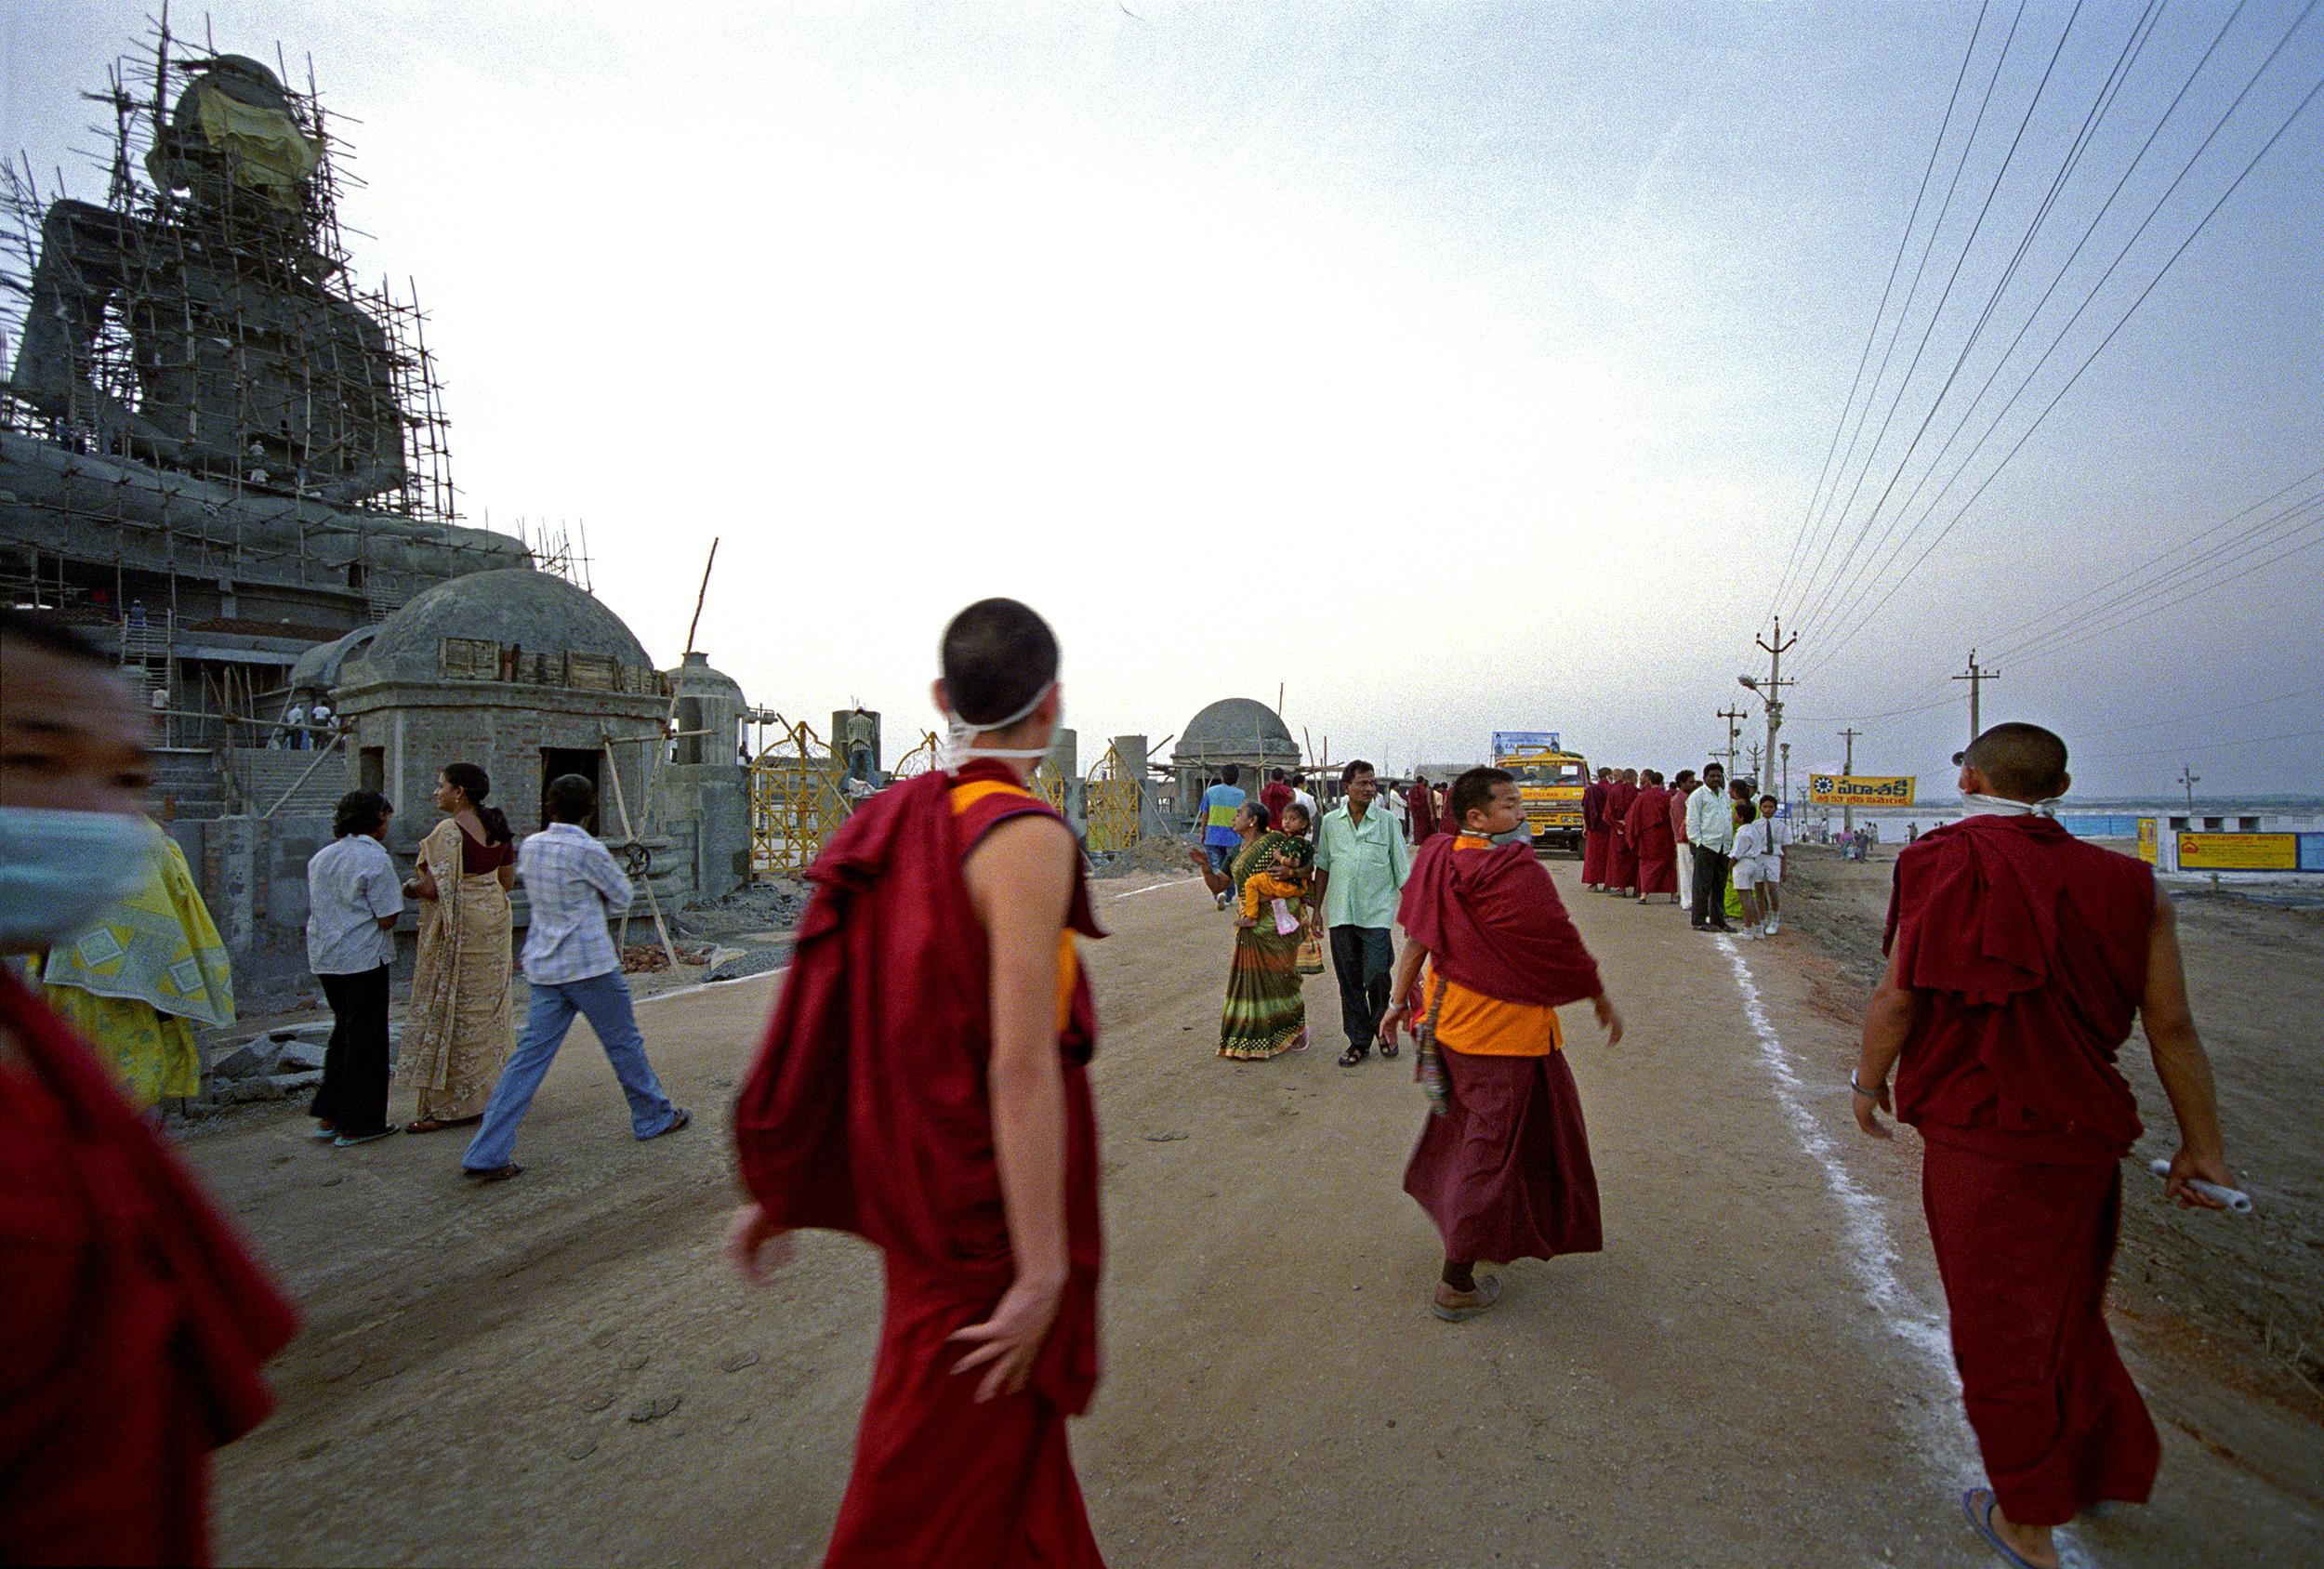 Web_amar_monks infront buddha4.1.jpg